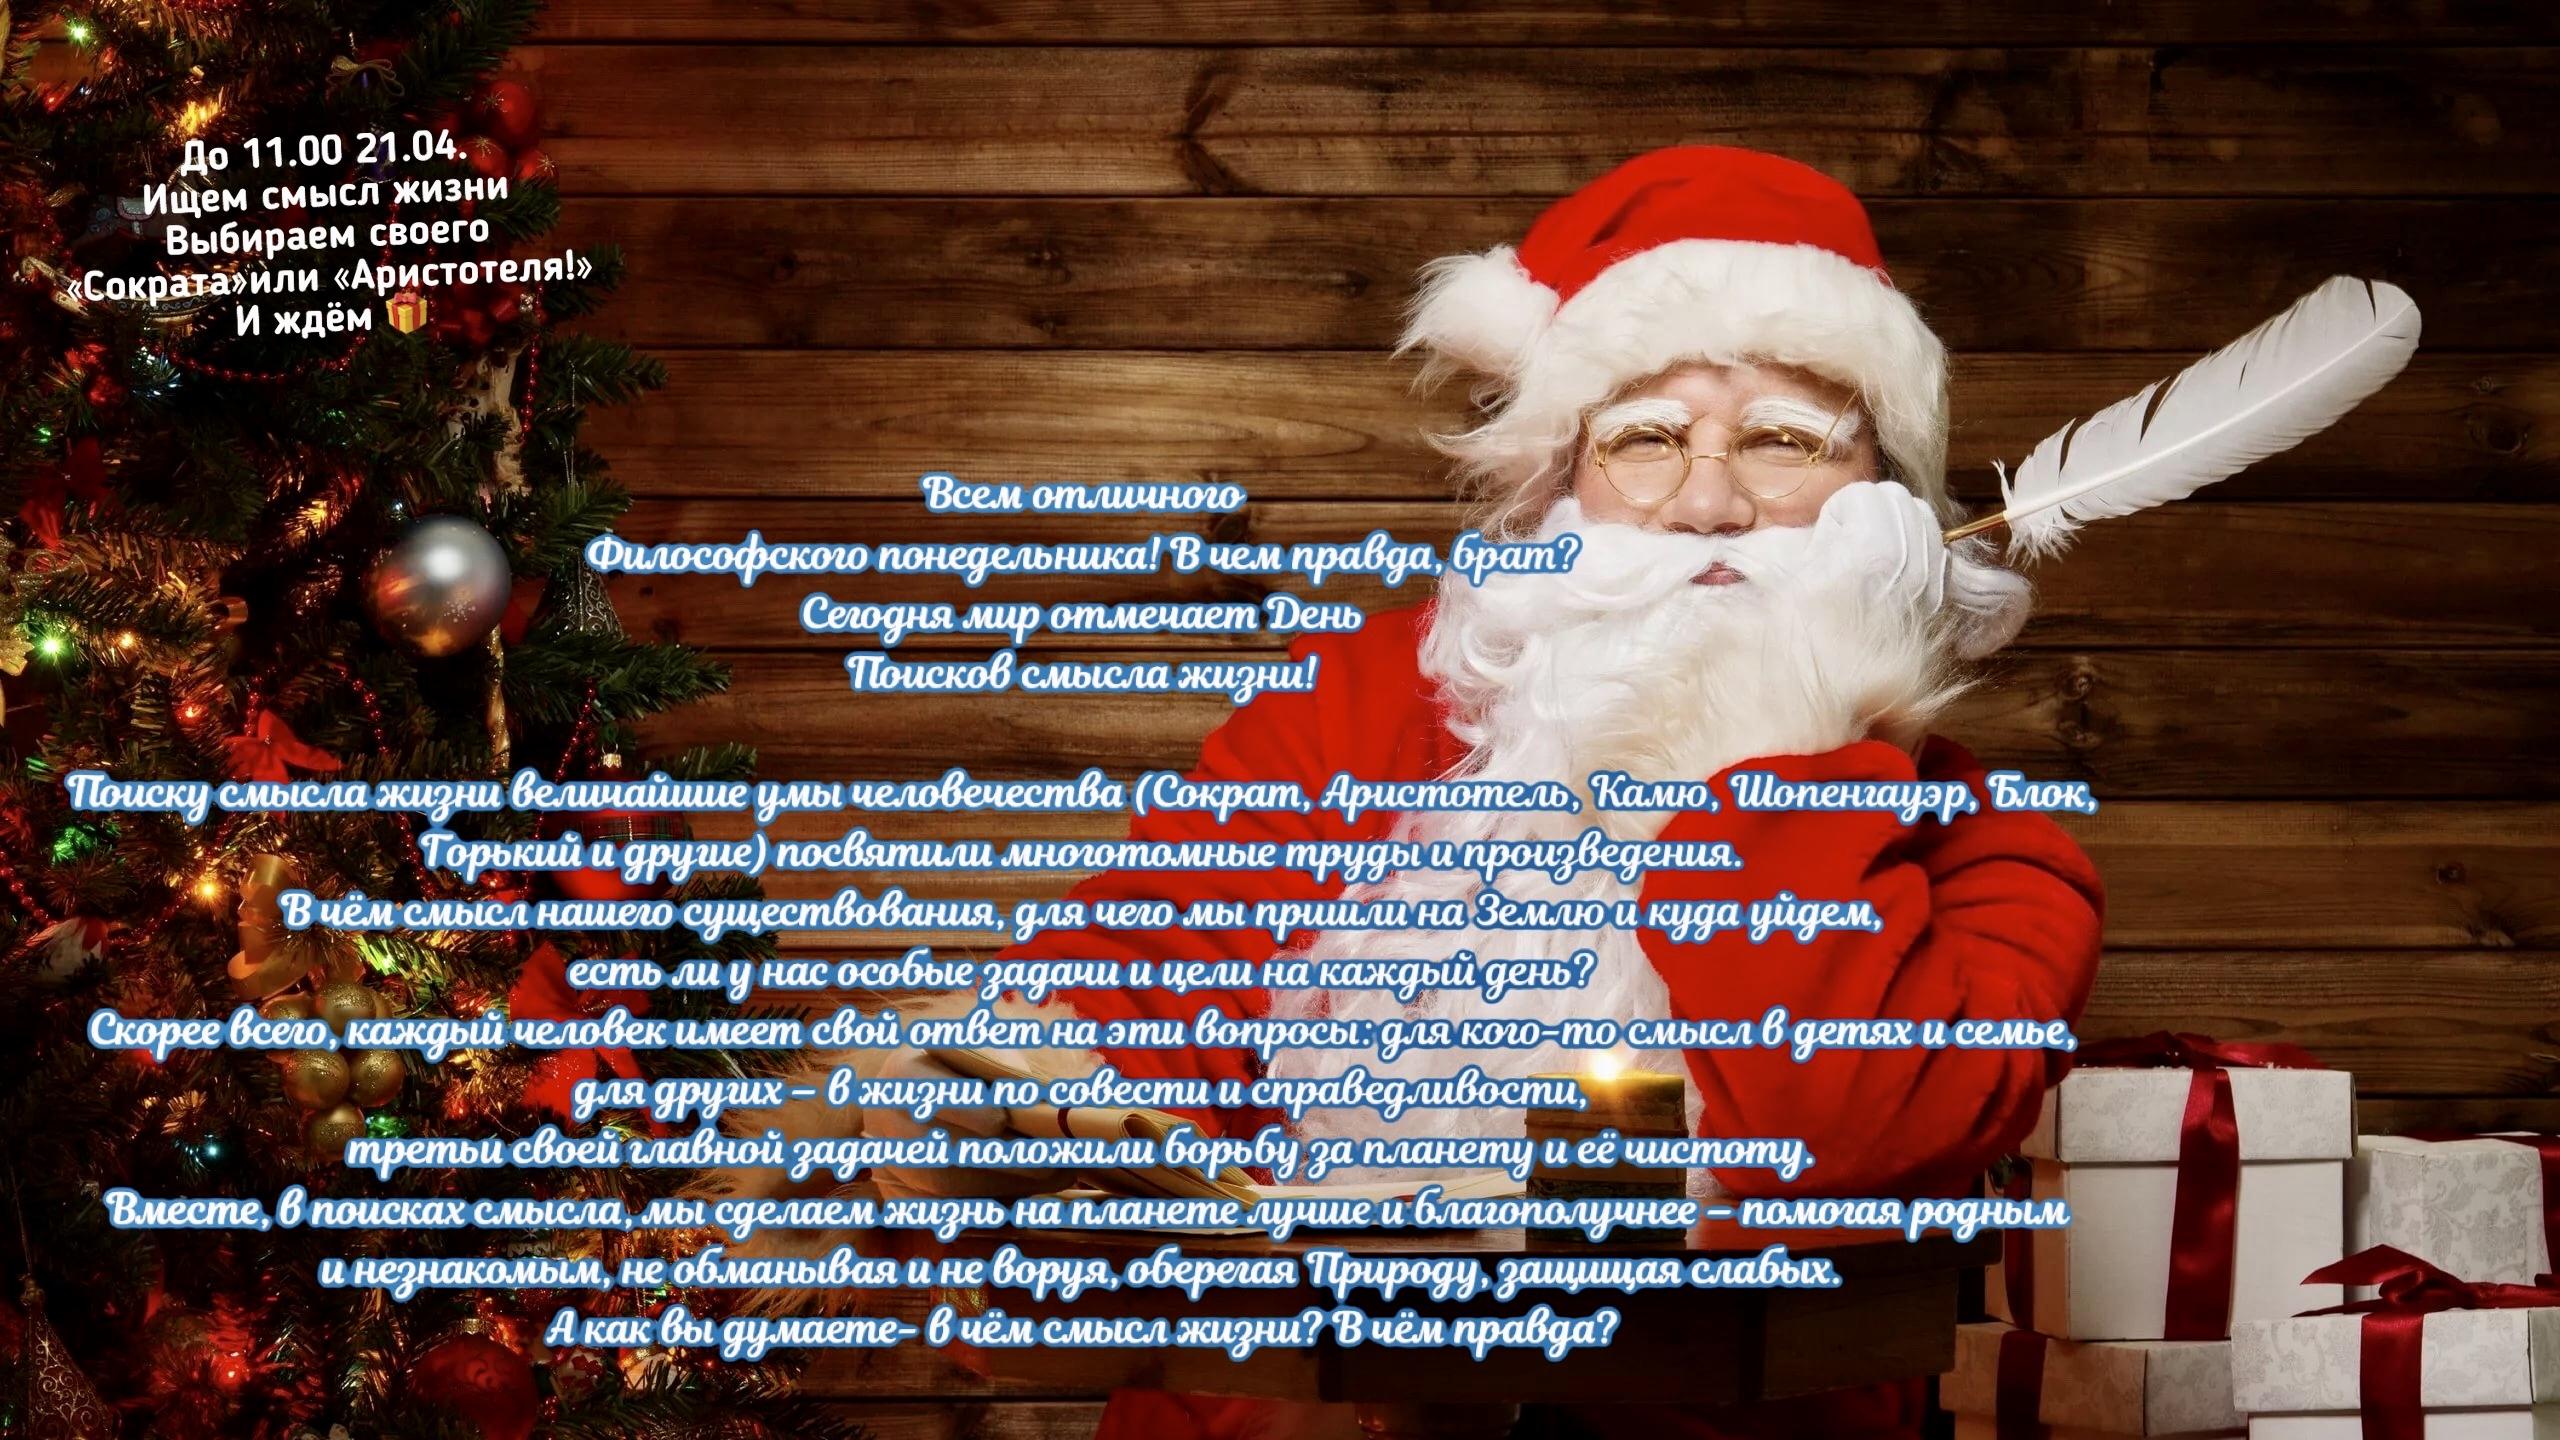 https://i3.imageban.ru/out/2020/04/20/78f20ae4347c44ecb05bb943b129d9b2.jpg